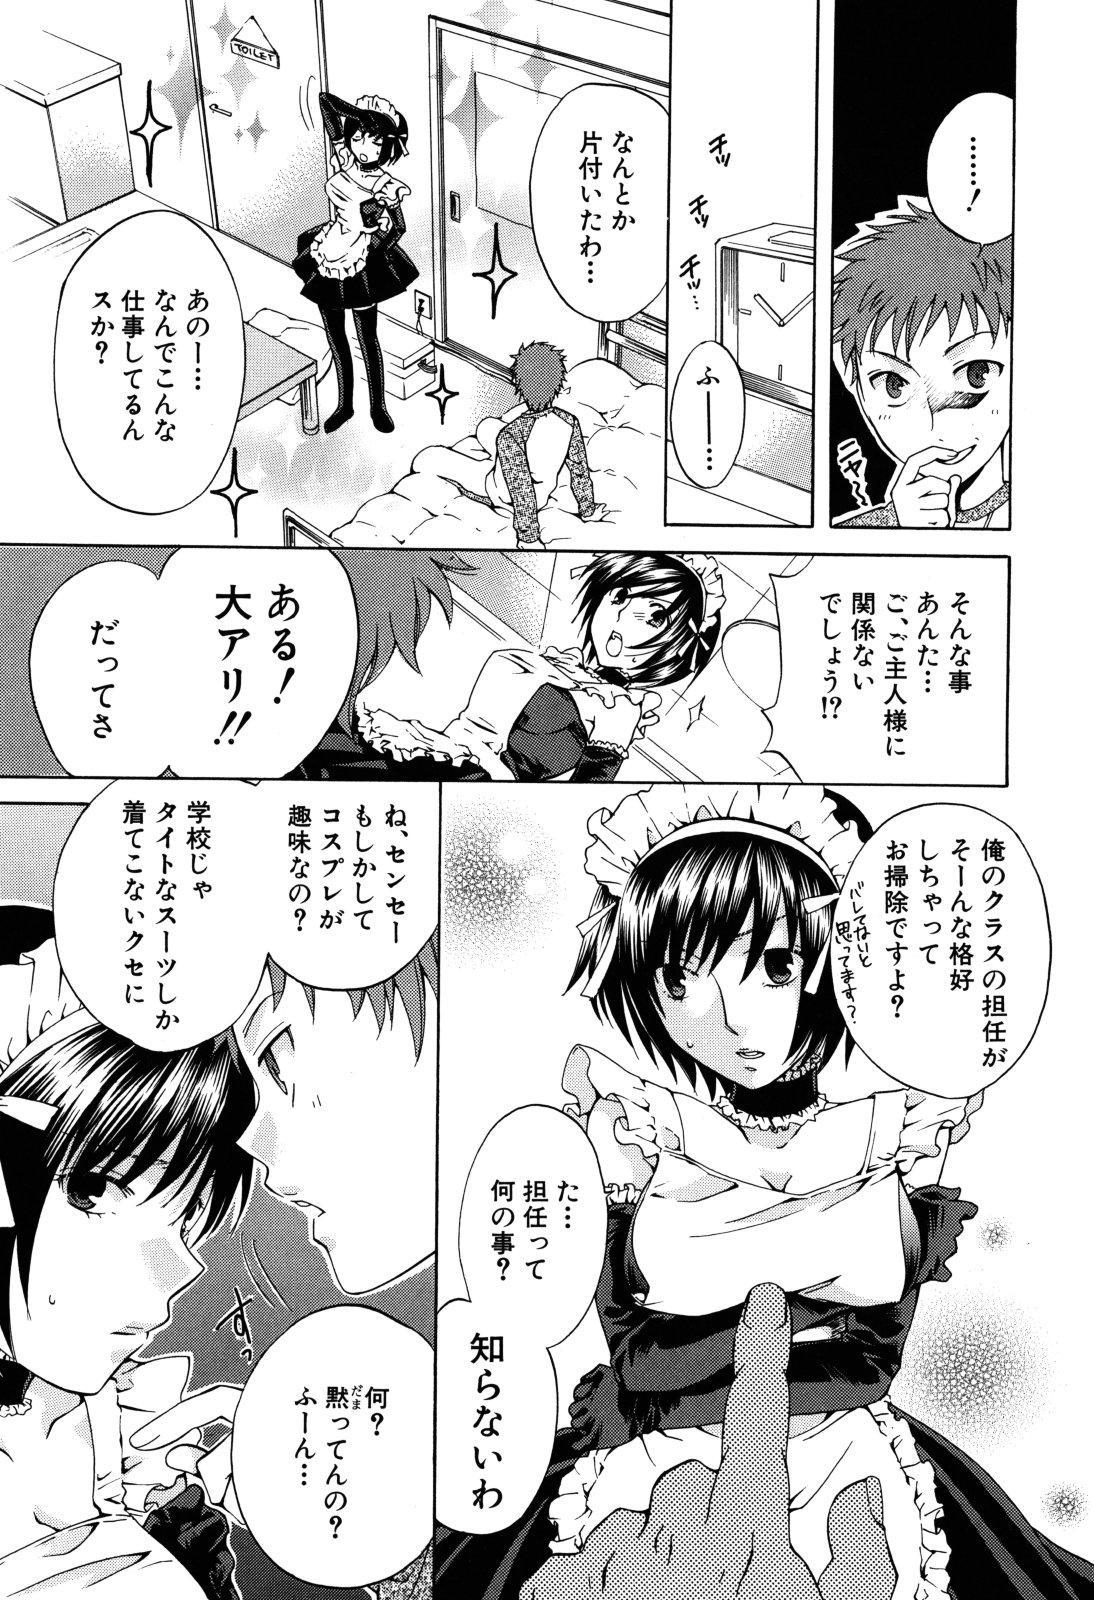 Kanojo ga Ochiru made - She in the depth 97